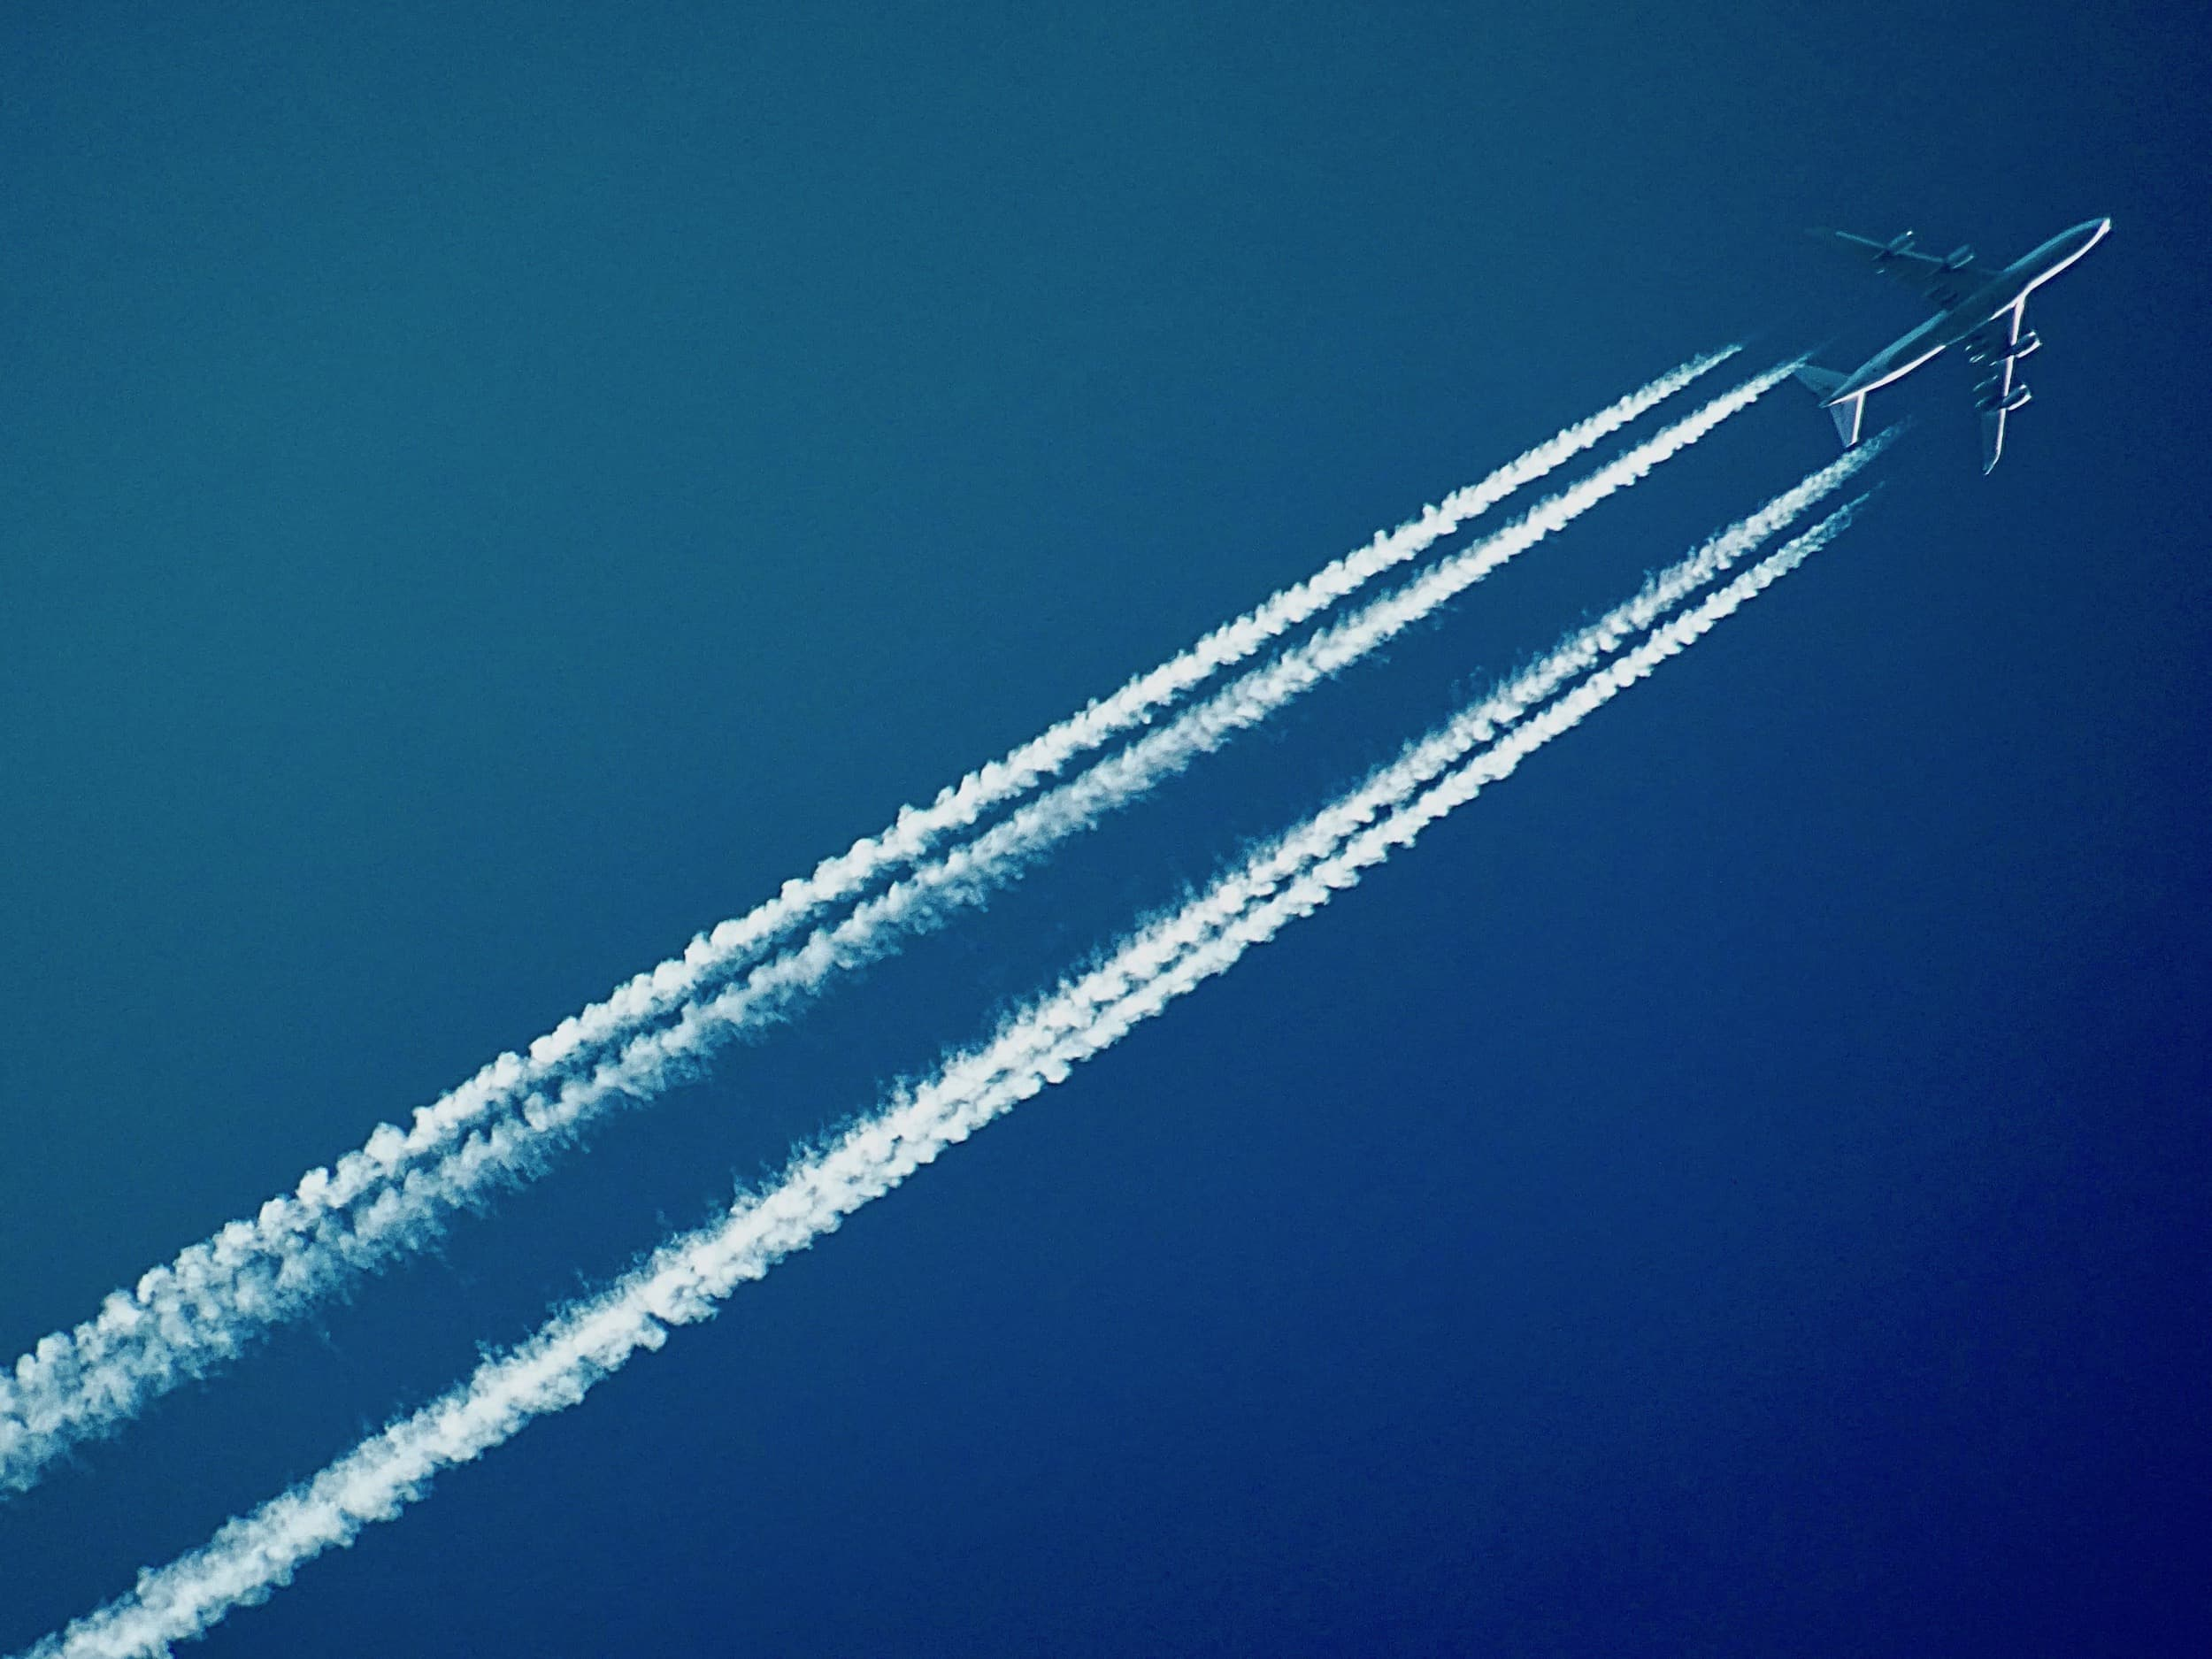 Flightnook - Contrails